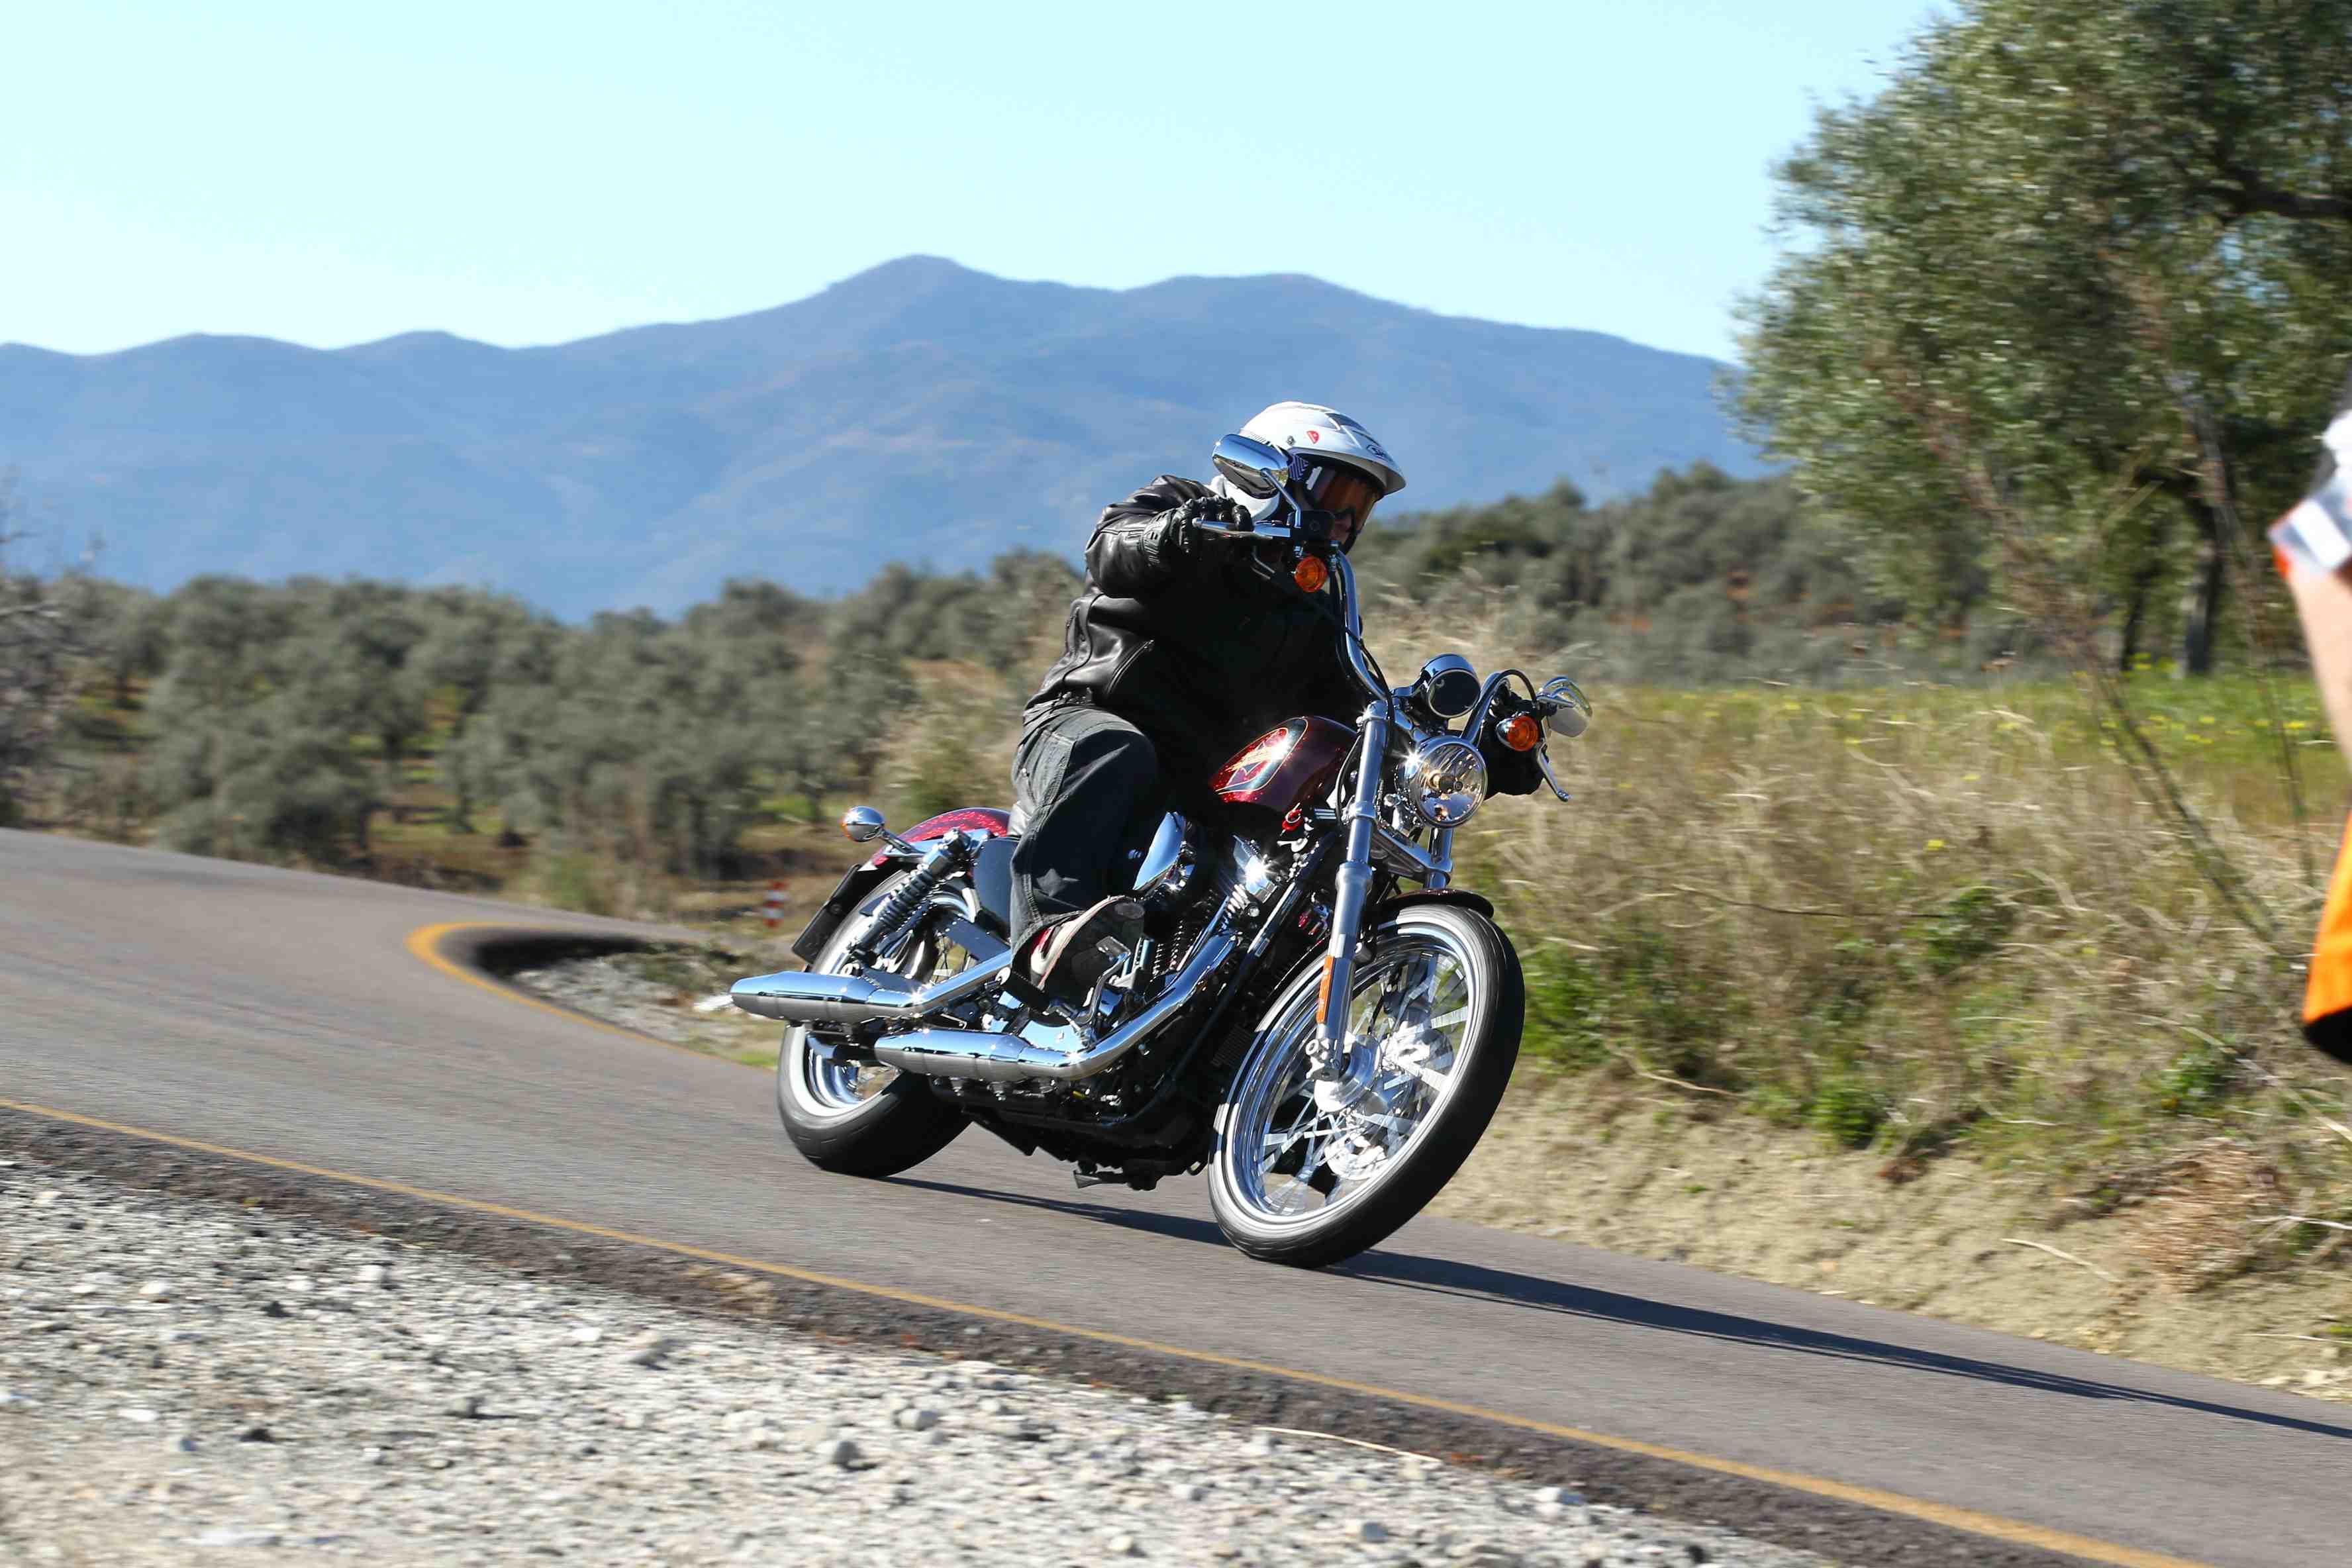 First Ride: Harley-Davidson Sportster 72